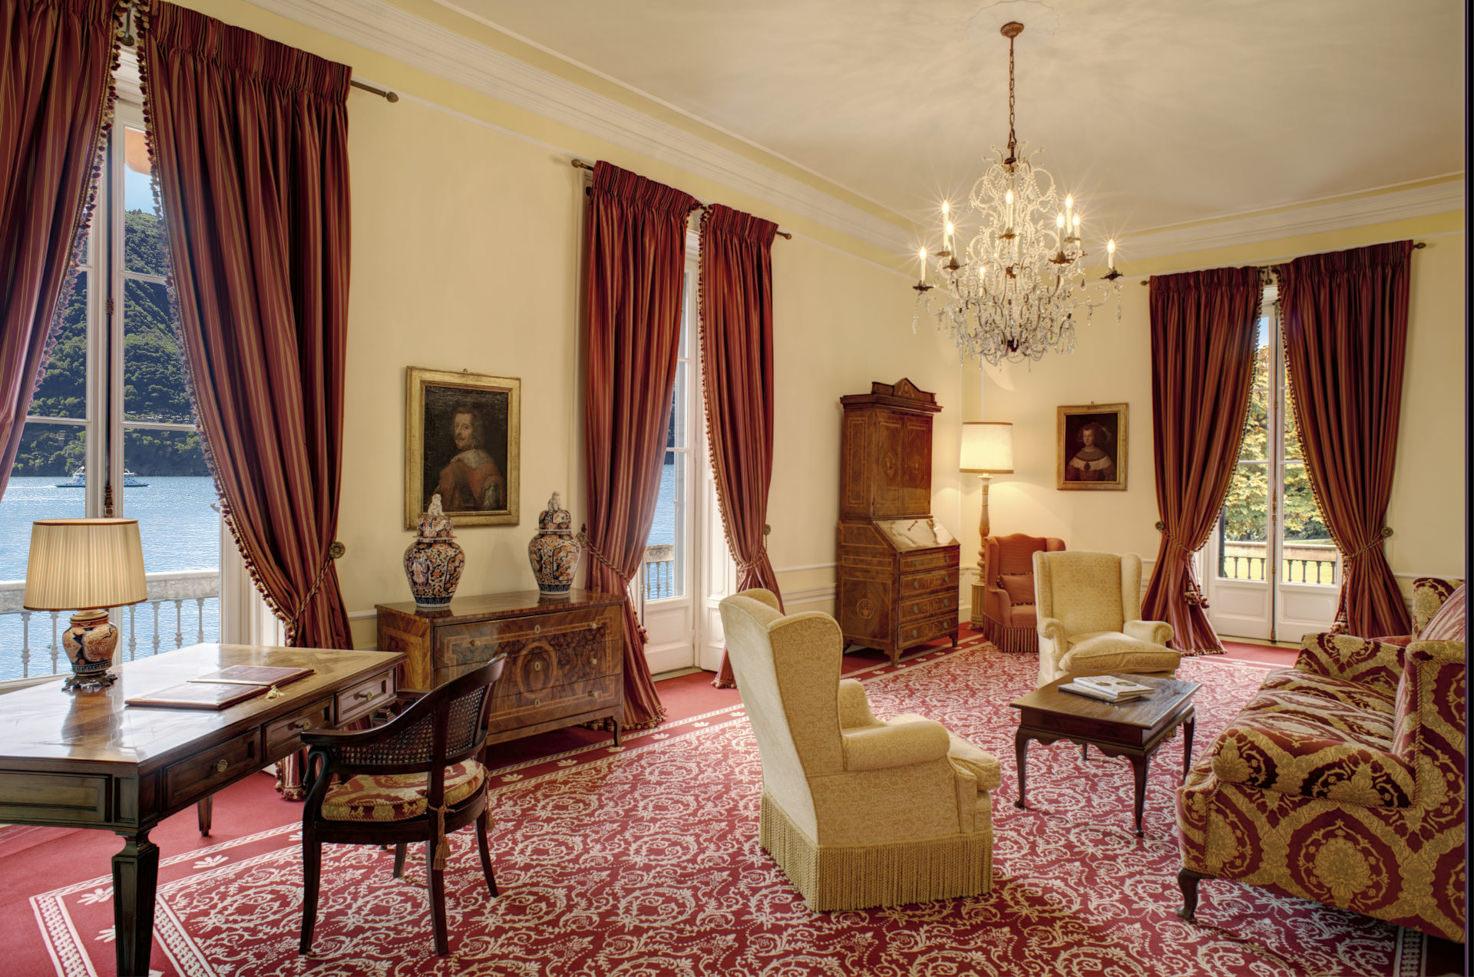 Presidential Suite of Villa D'Este